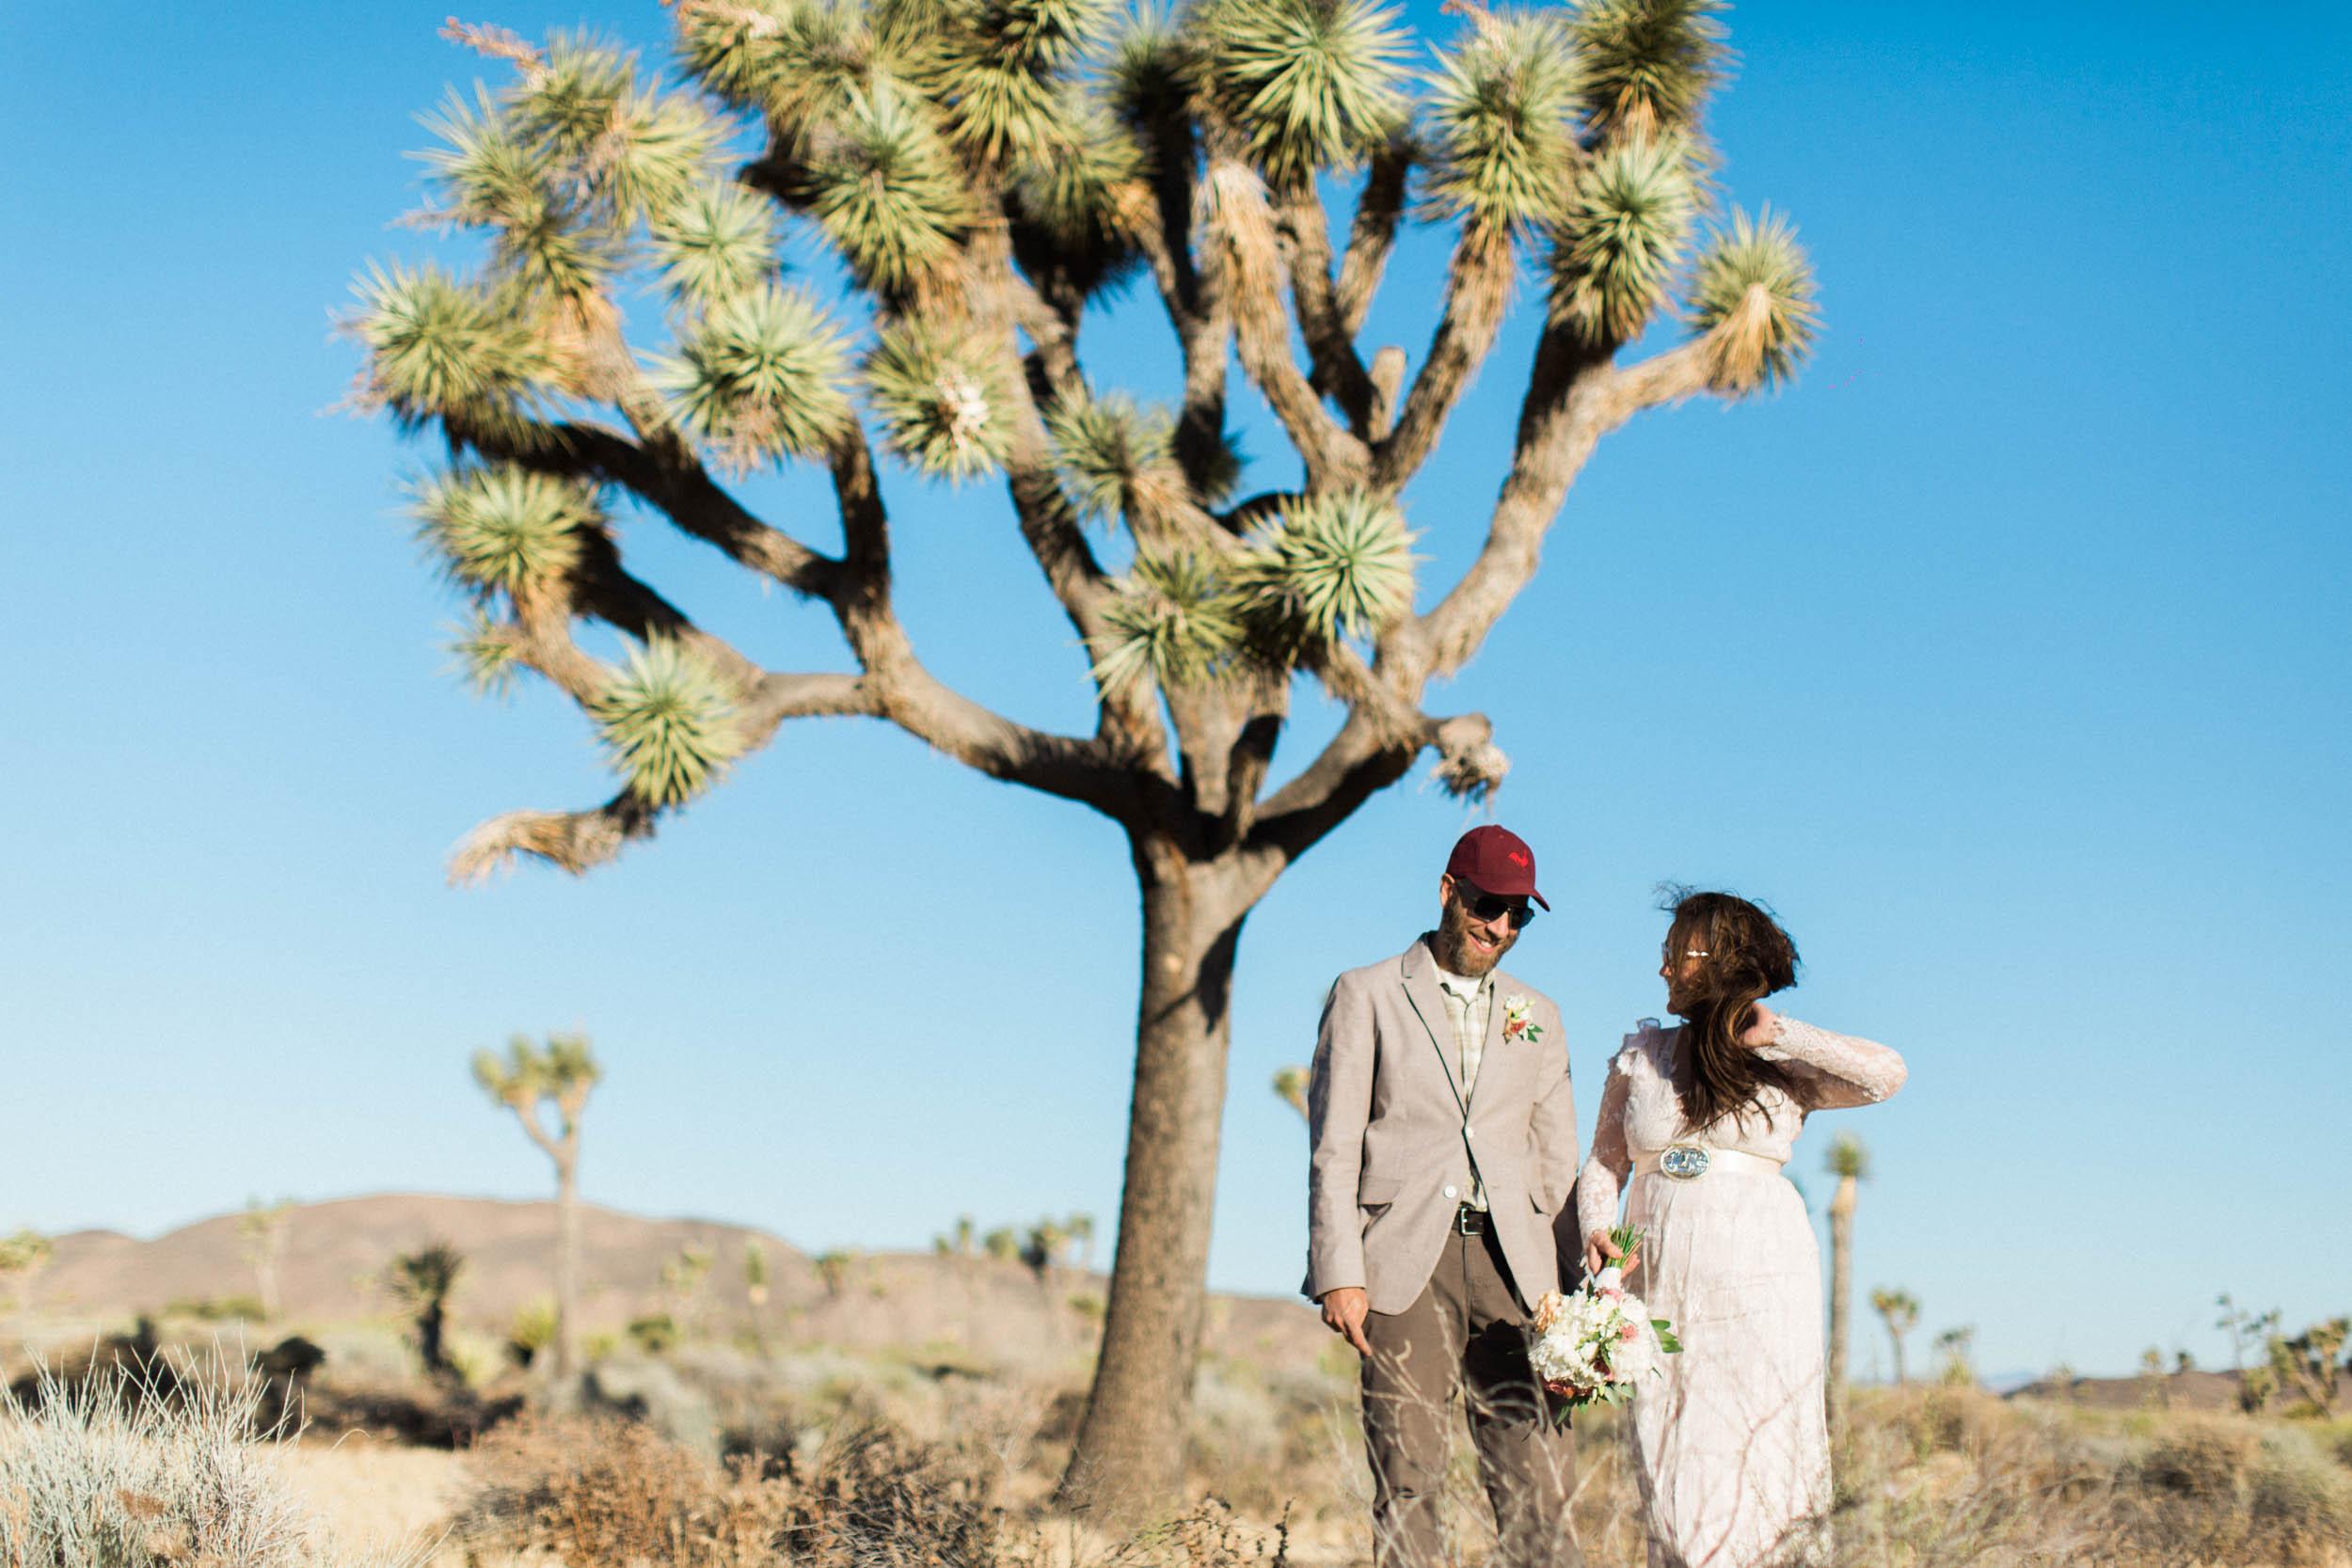 BKM-Photography-Joshua-Tree-Desert-Wedding-Elopement-0035.jpg